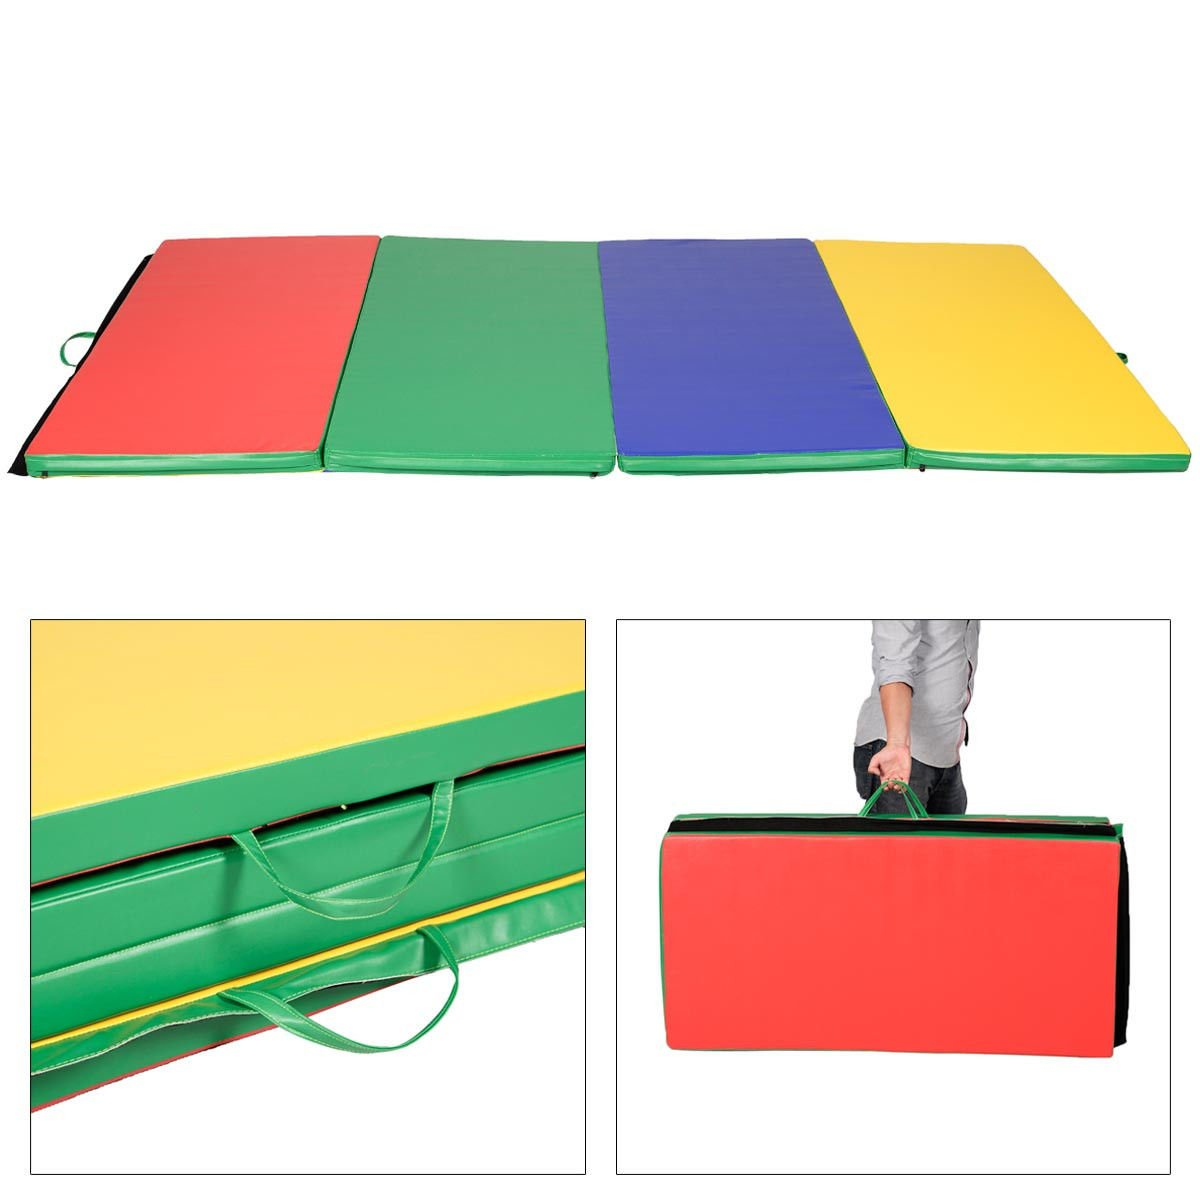 Generic 4 x8 x2 PU Gymnastics Mat Gym Folding Panel Exercise Tumbling Pad 4 Colors Yoga